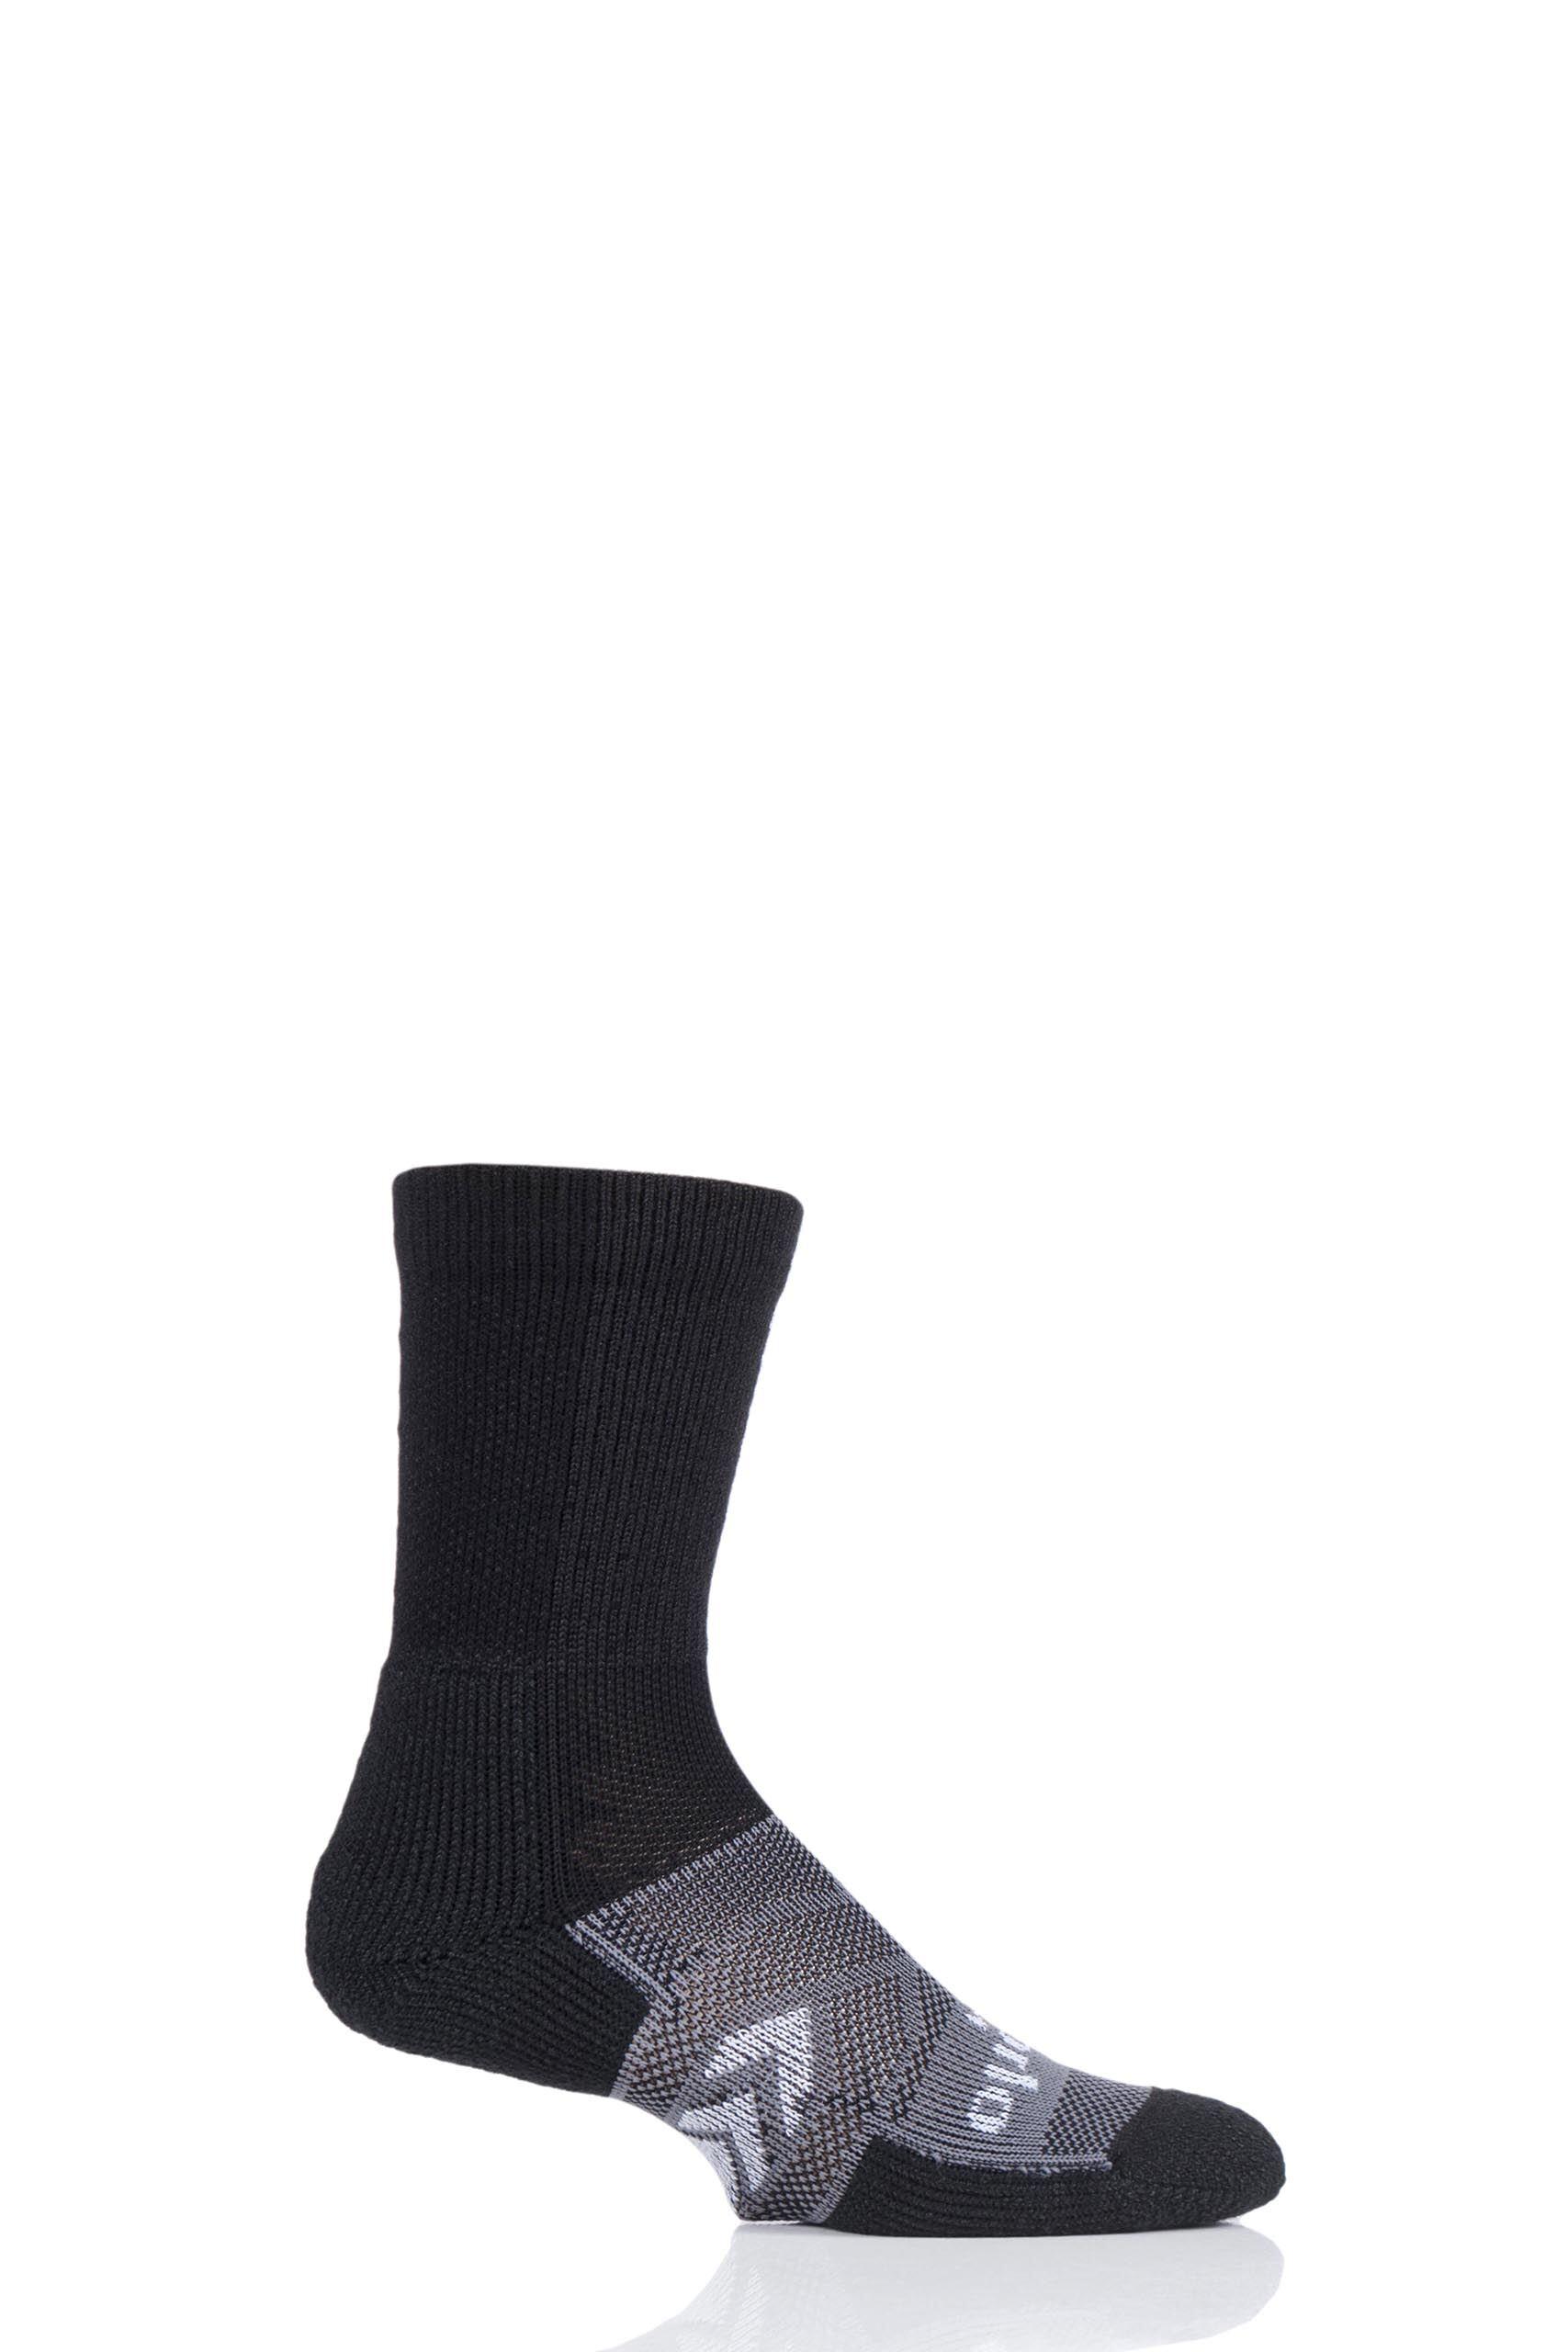 Image of 1 Pair Black 12 Hour Shift Work Socks Unisex 12.5-14 Mens - Thorlos